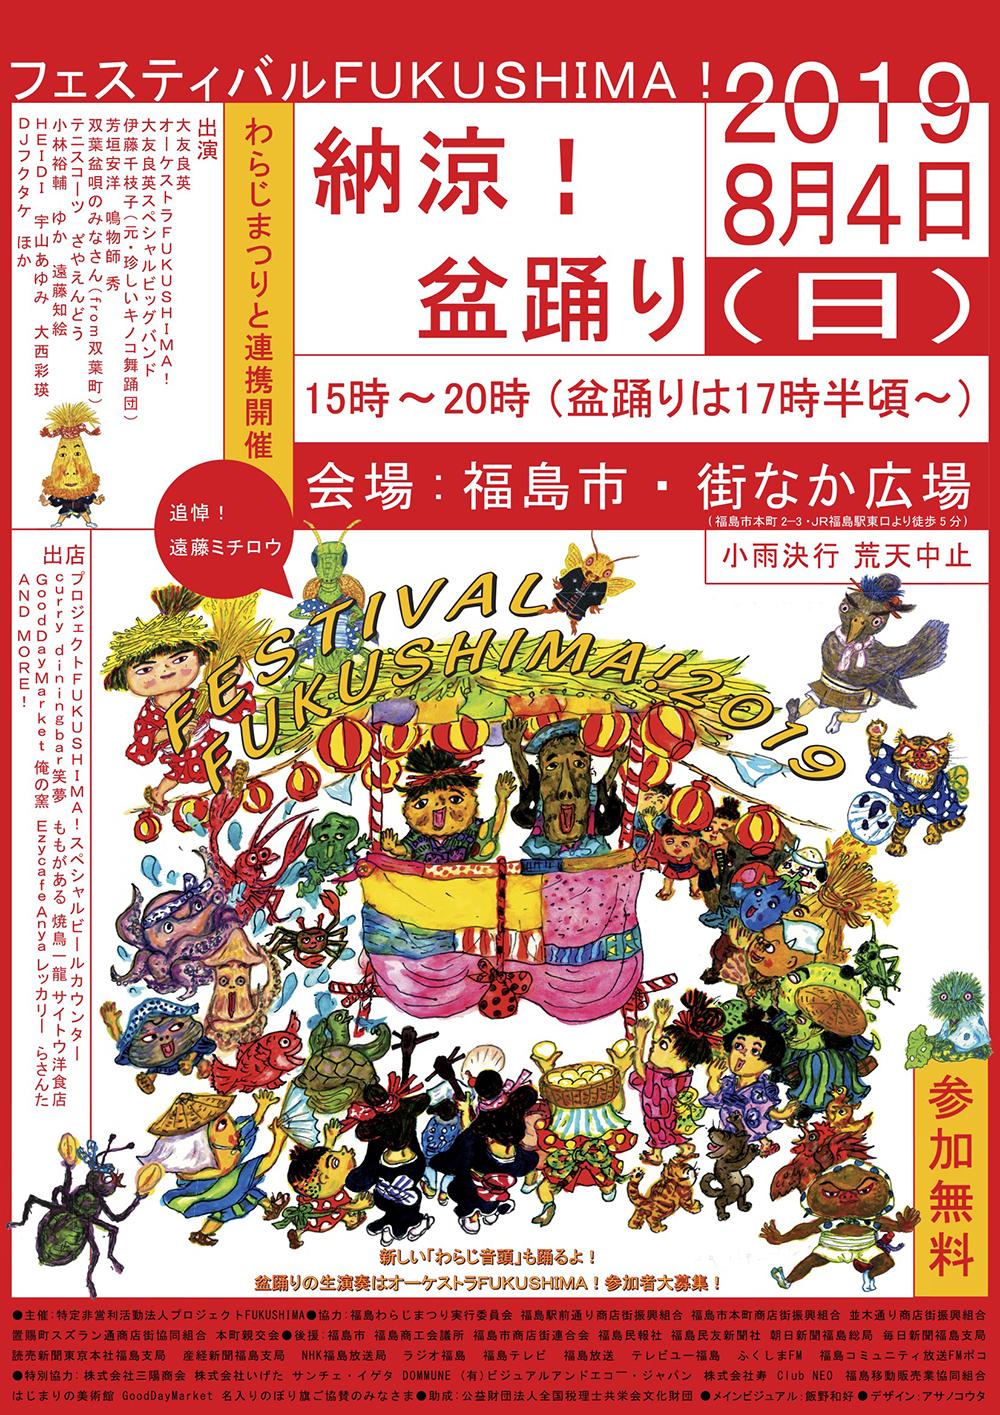 festival fukushima 2019 synradio